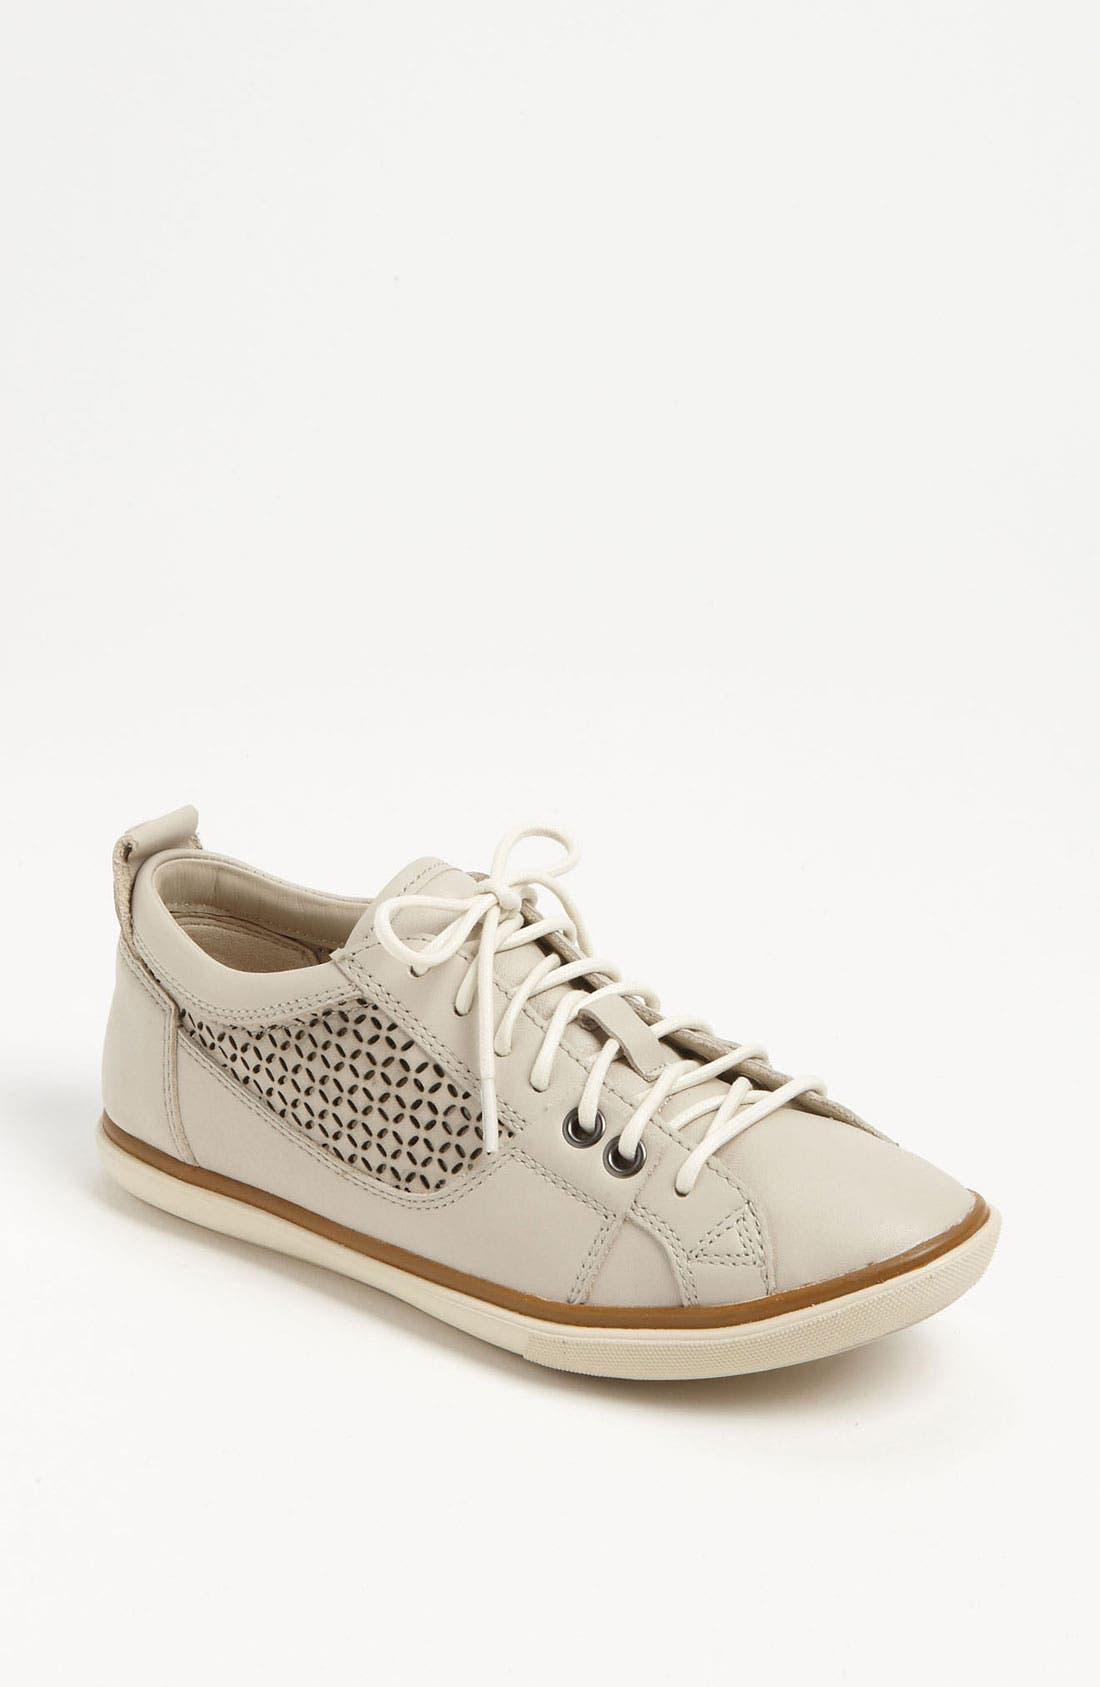 Alternate Image 1 Selected - Geox 'Alike' Sneaker (Women) (Online Only)